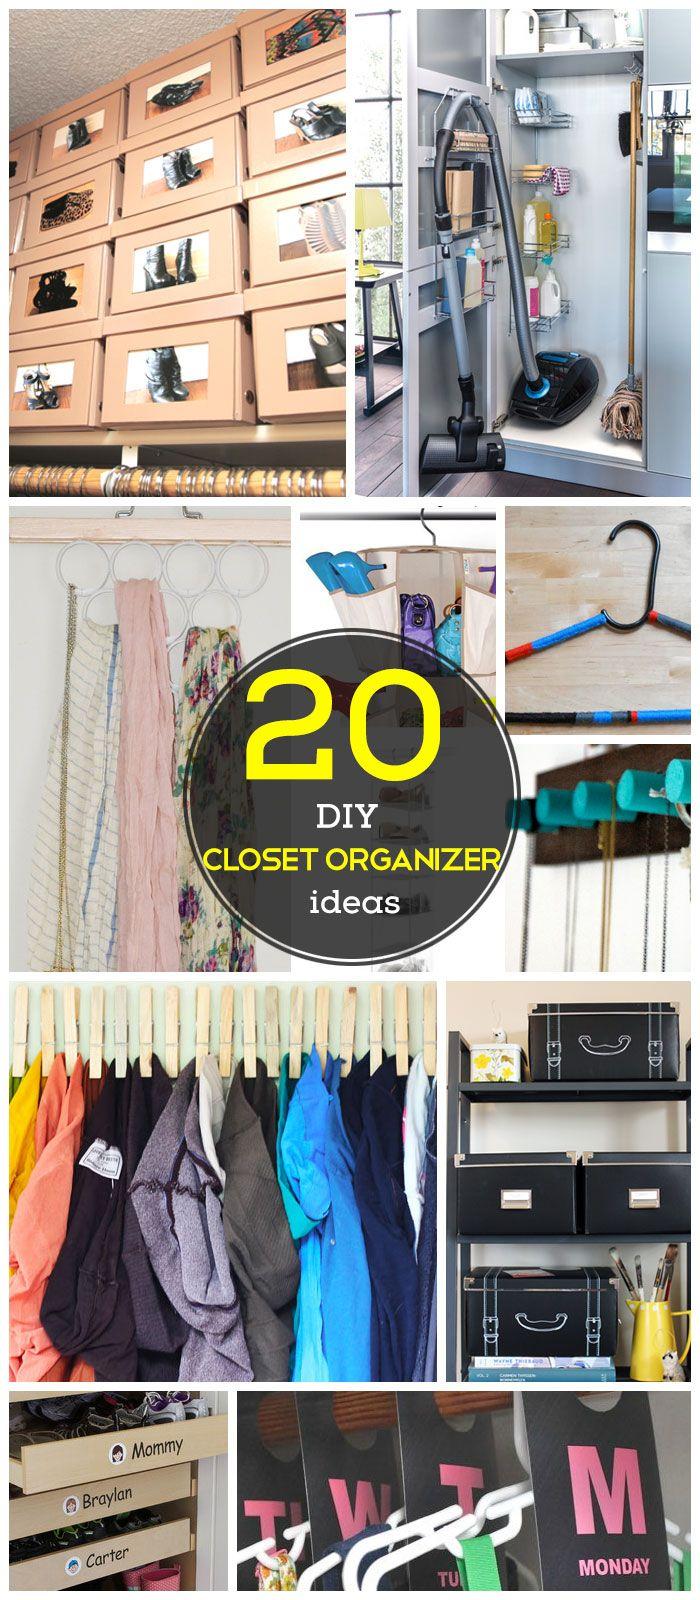 20 DIY Closet Organization Ideas for the Home   DIY Closet Storage Ideas for Small Spaces